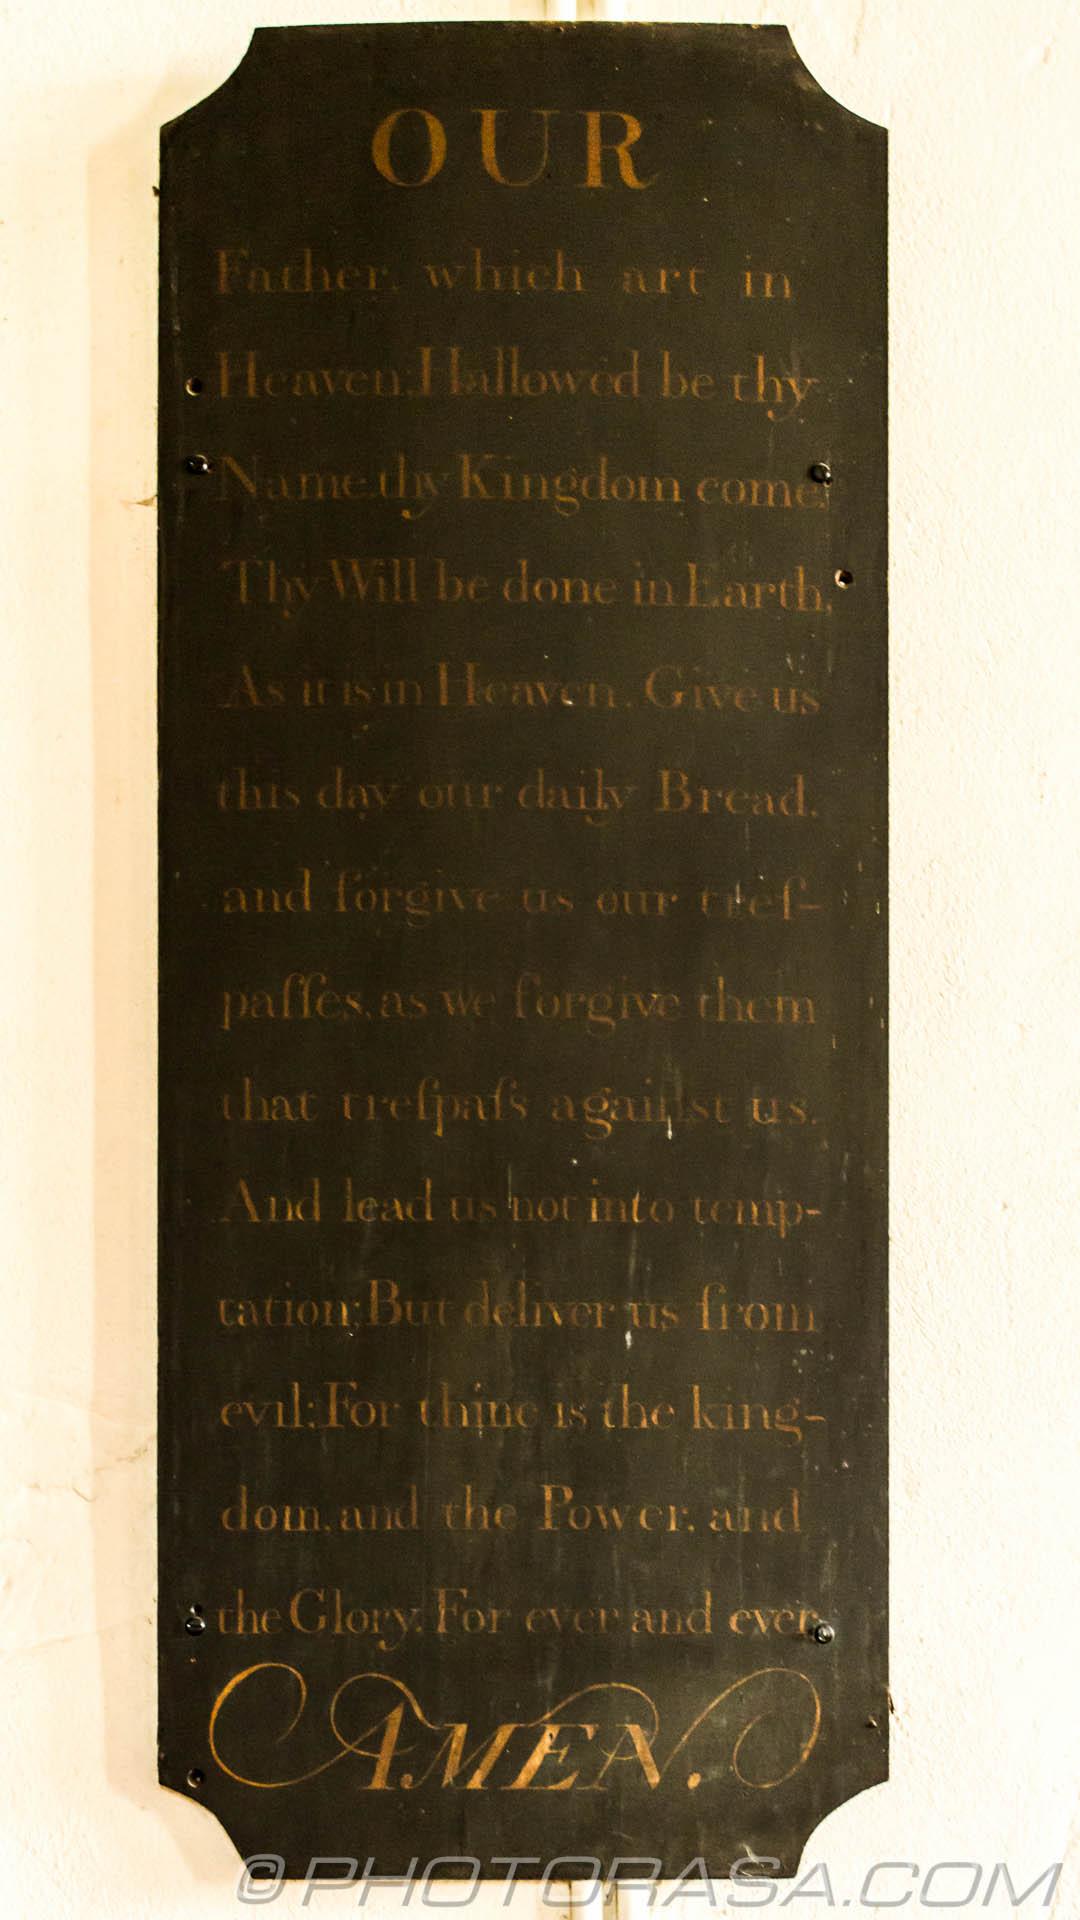 http://photorasa.com/parish-church-st-peter-st-paul-headcorn/wall-panel-showing-lords-prayer/